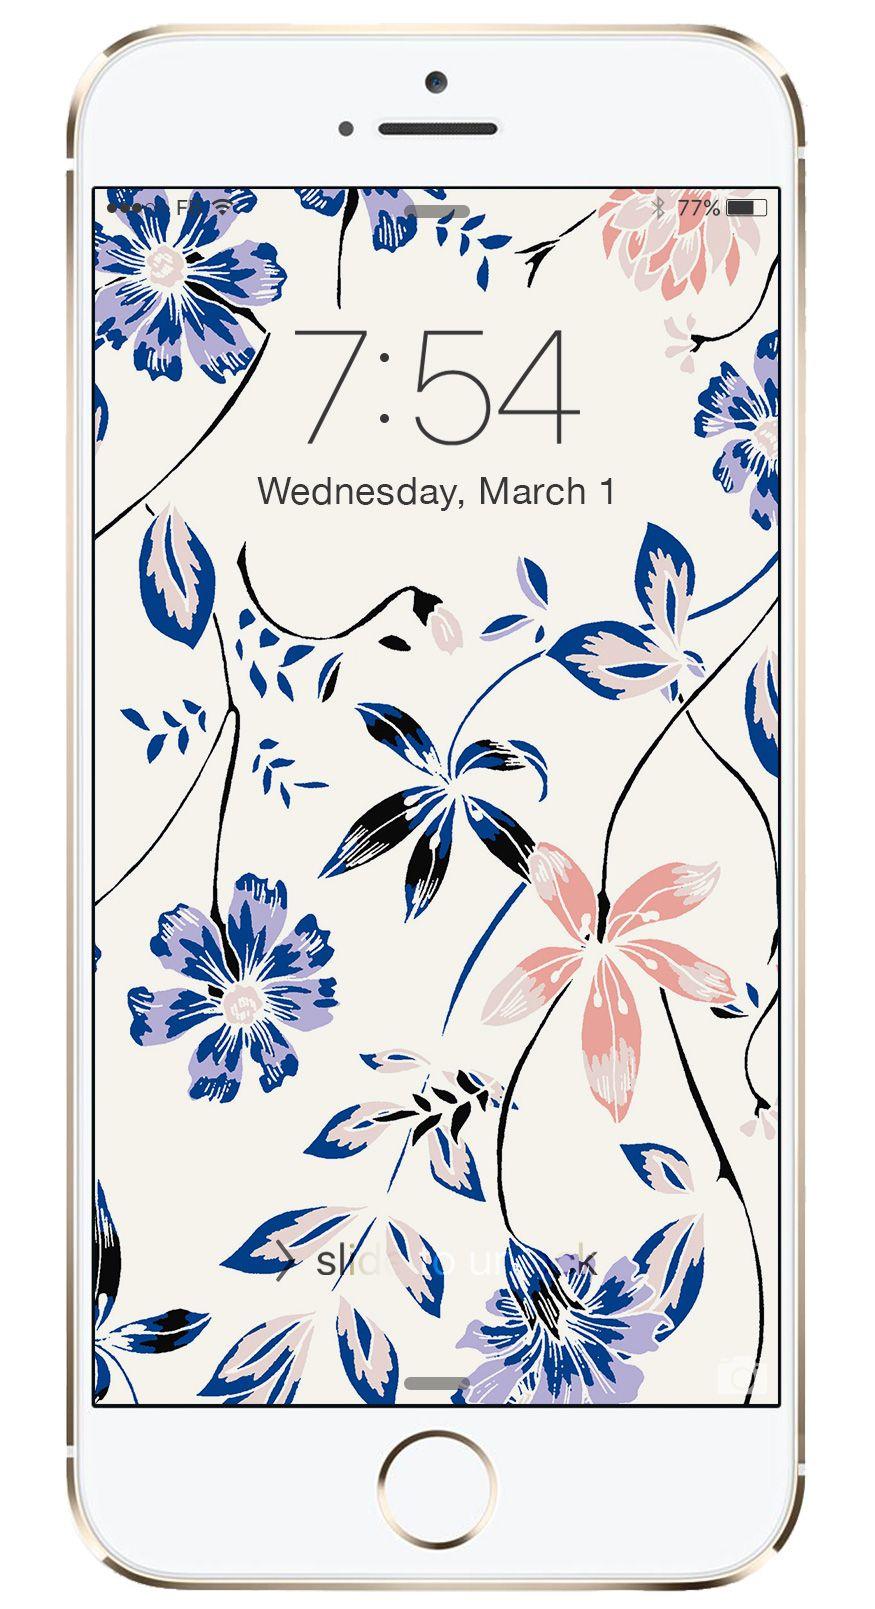 March 2017 Desktop Downloads Iphone wallpaper